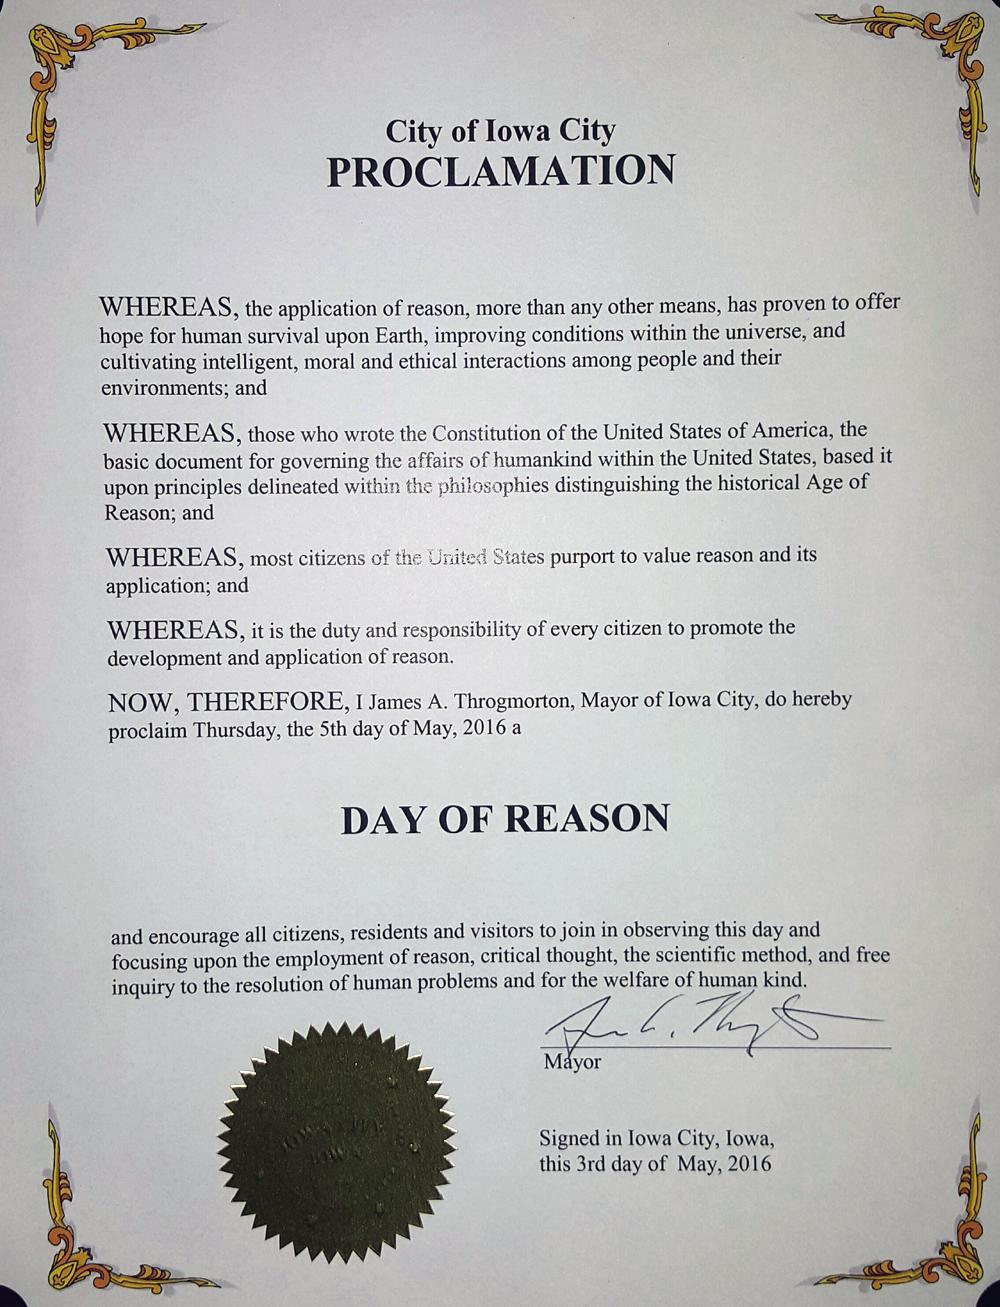 NDOR 2016 Iowa City Proclamation.jpg